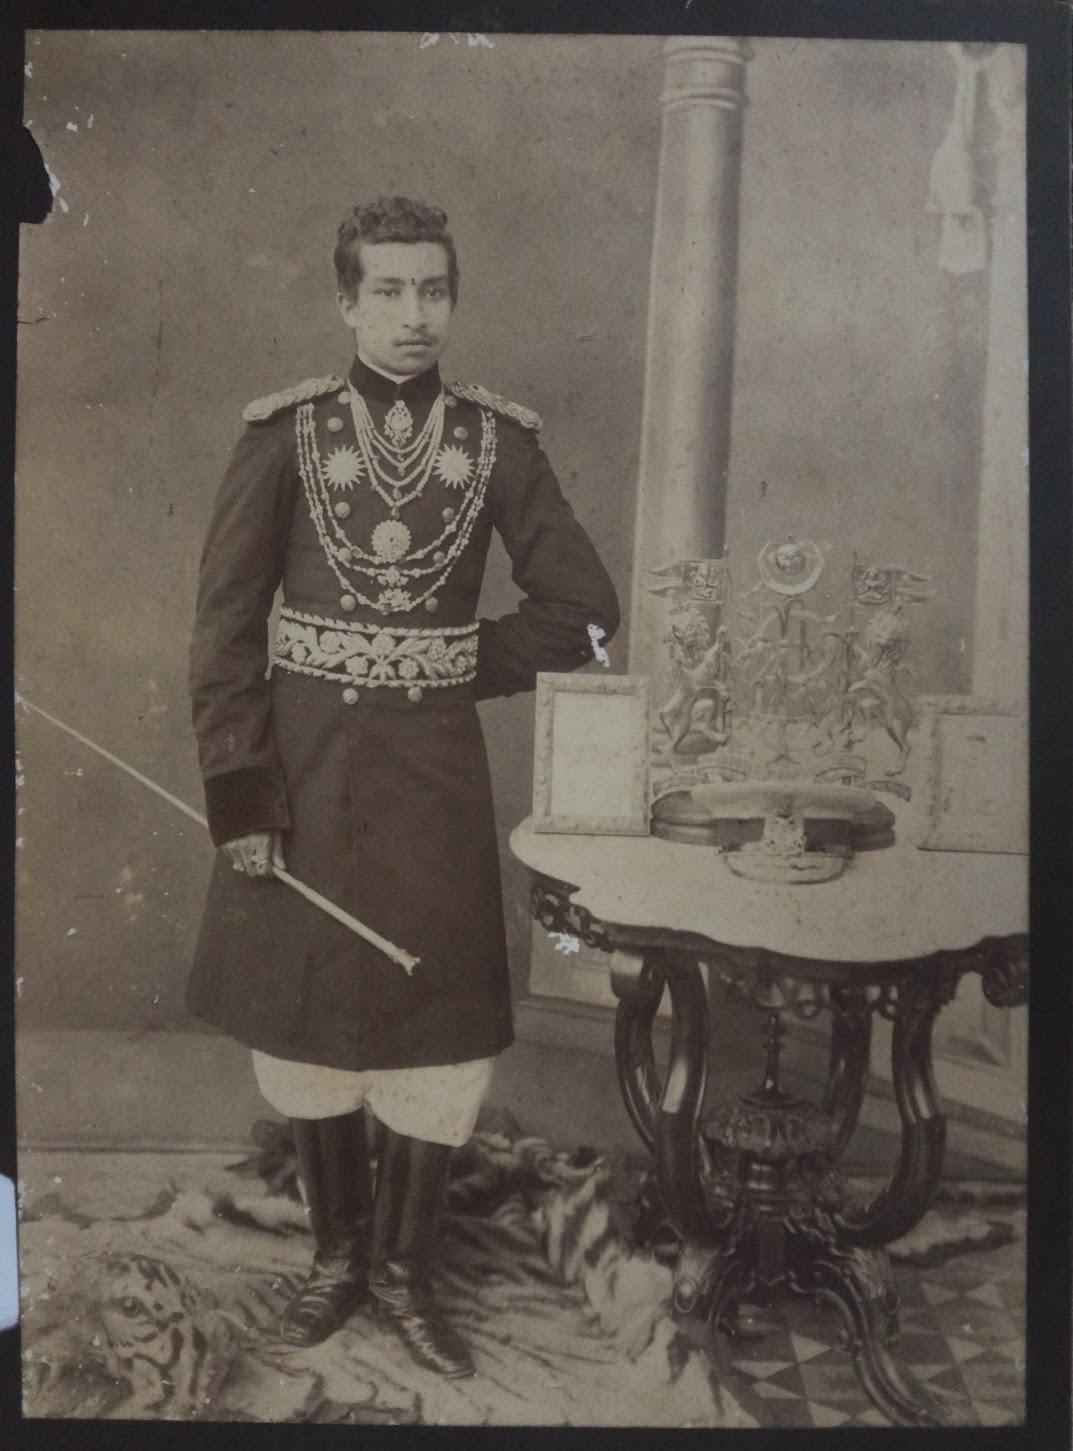 Vintage Photograph of a Nepal Prince